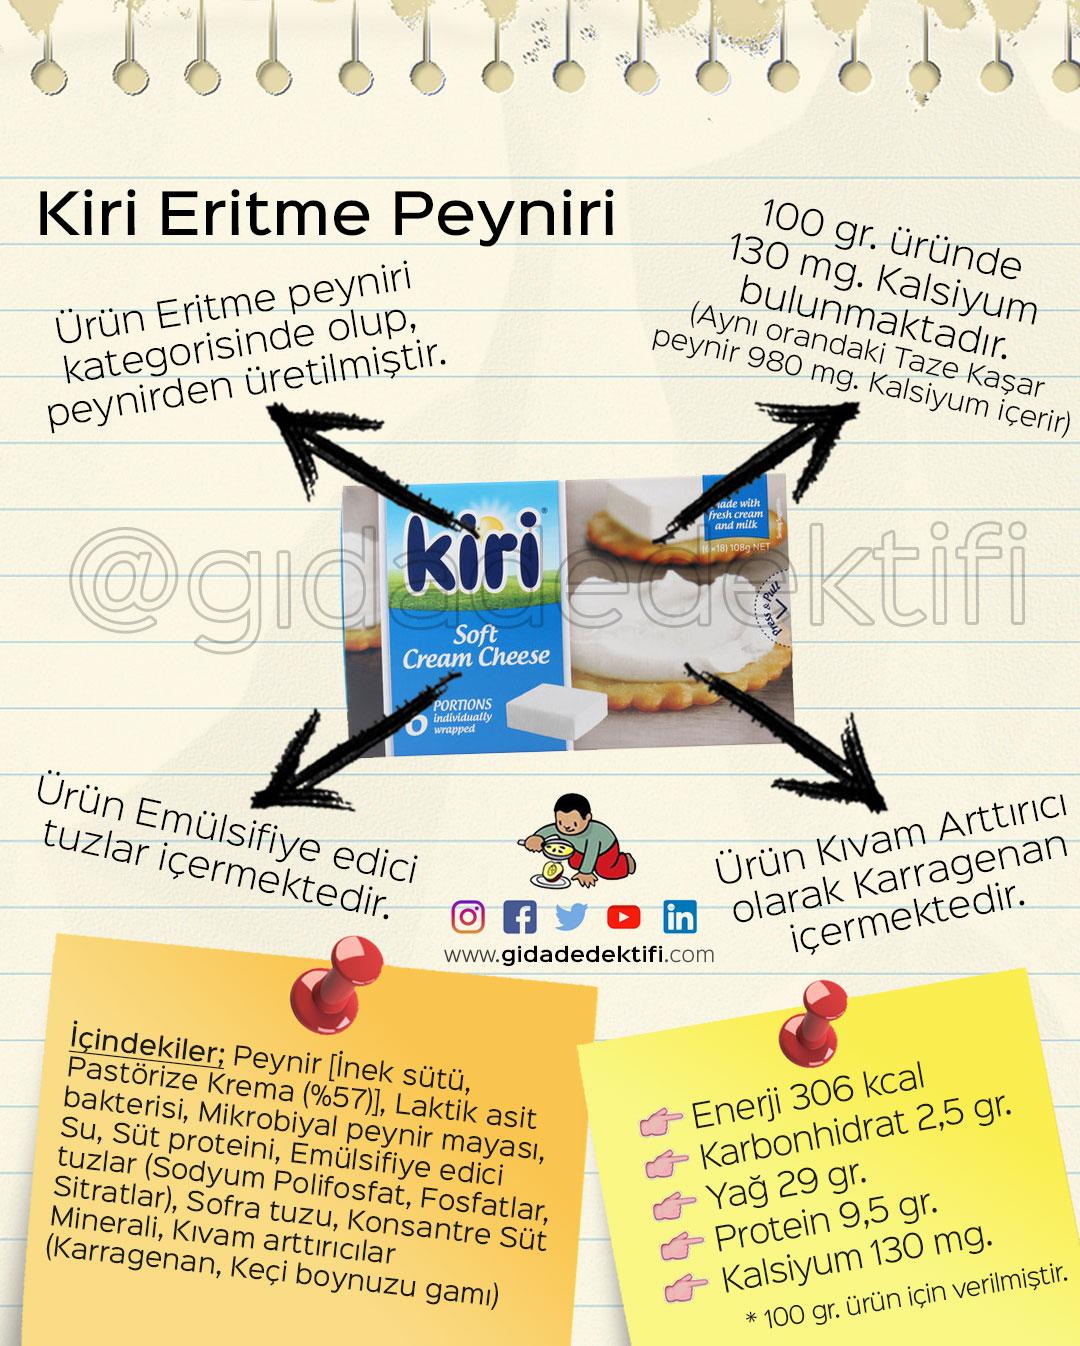 Kiri-Eritme-Peyniri